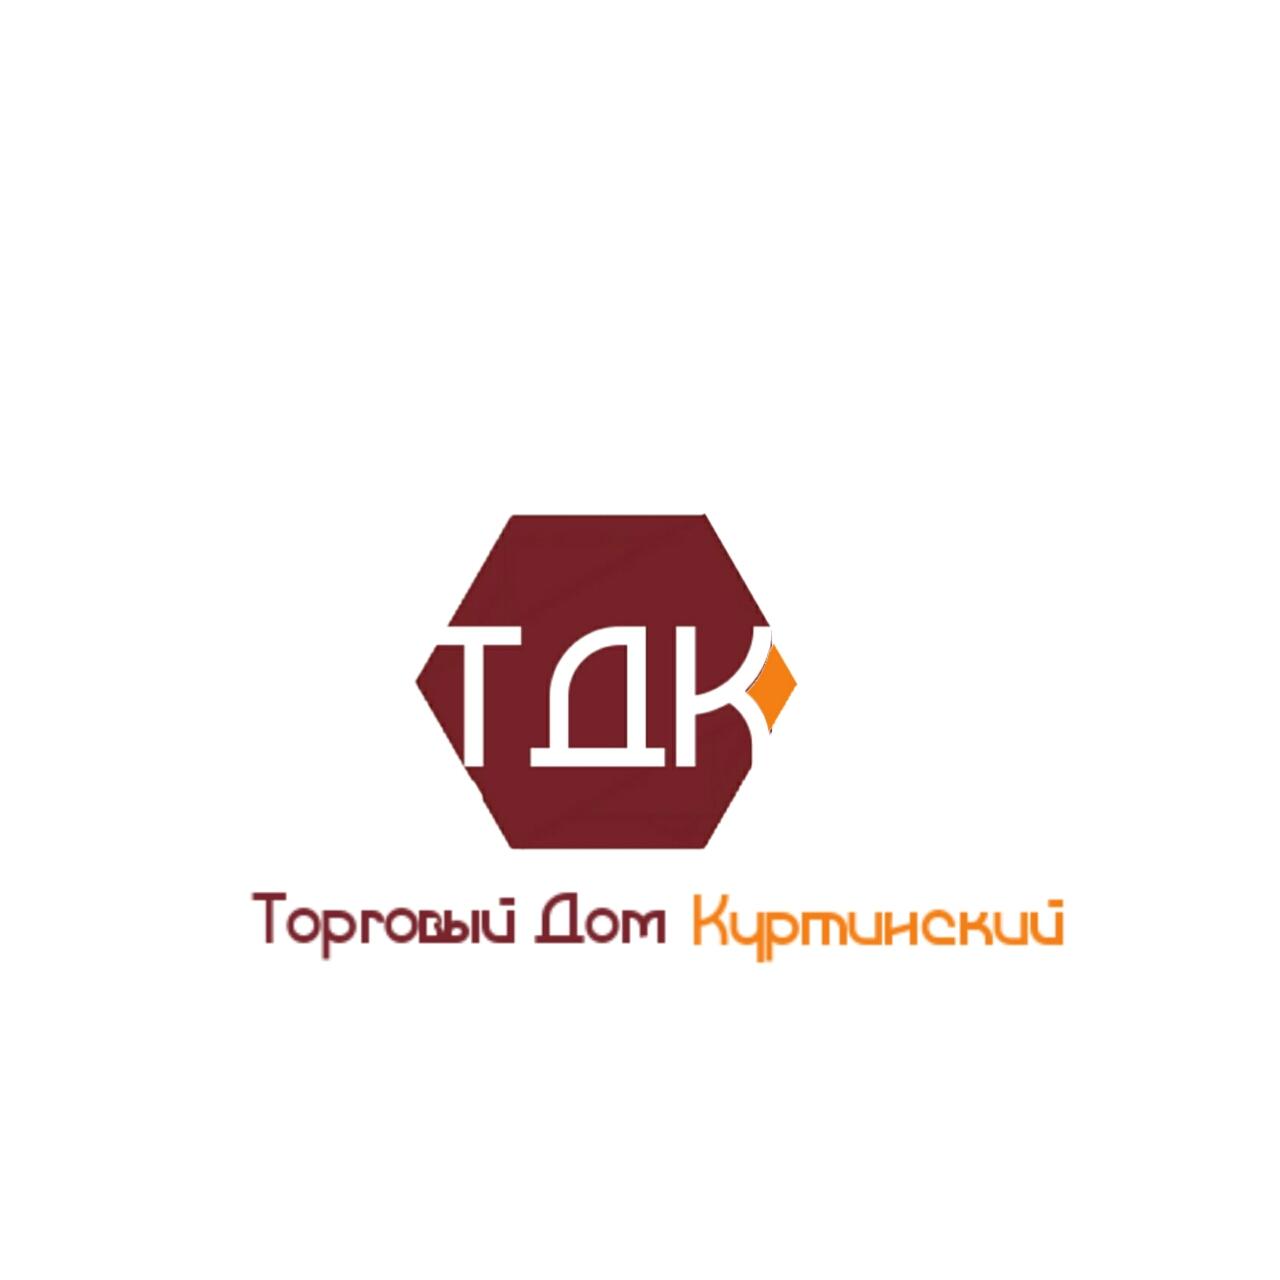 Логотип для камнедобывающей компании фото f_7895b991ae888d1f.jpg